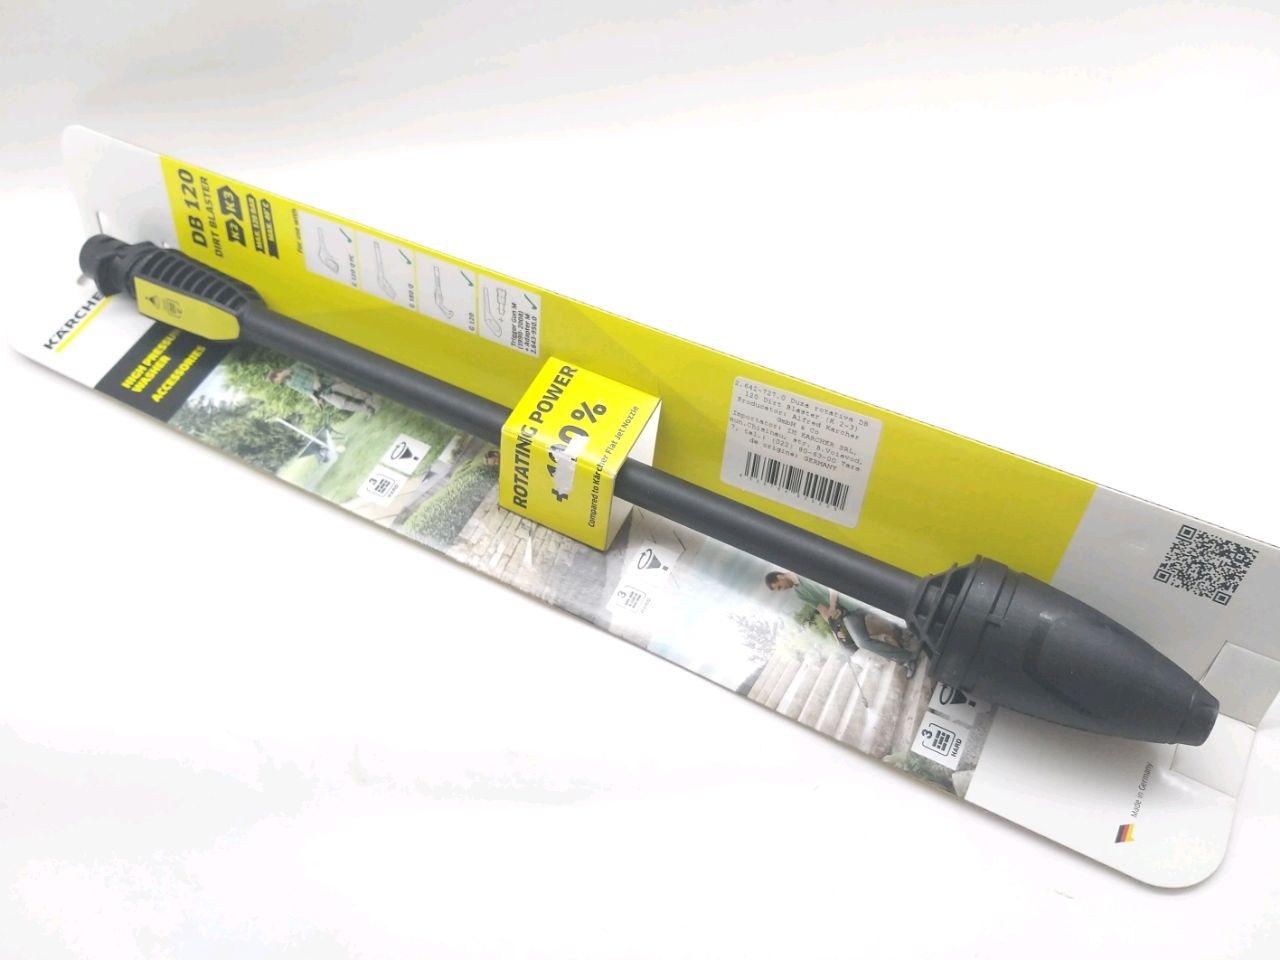 Duza rotativa Dirt Blaster p/u K2-K3